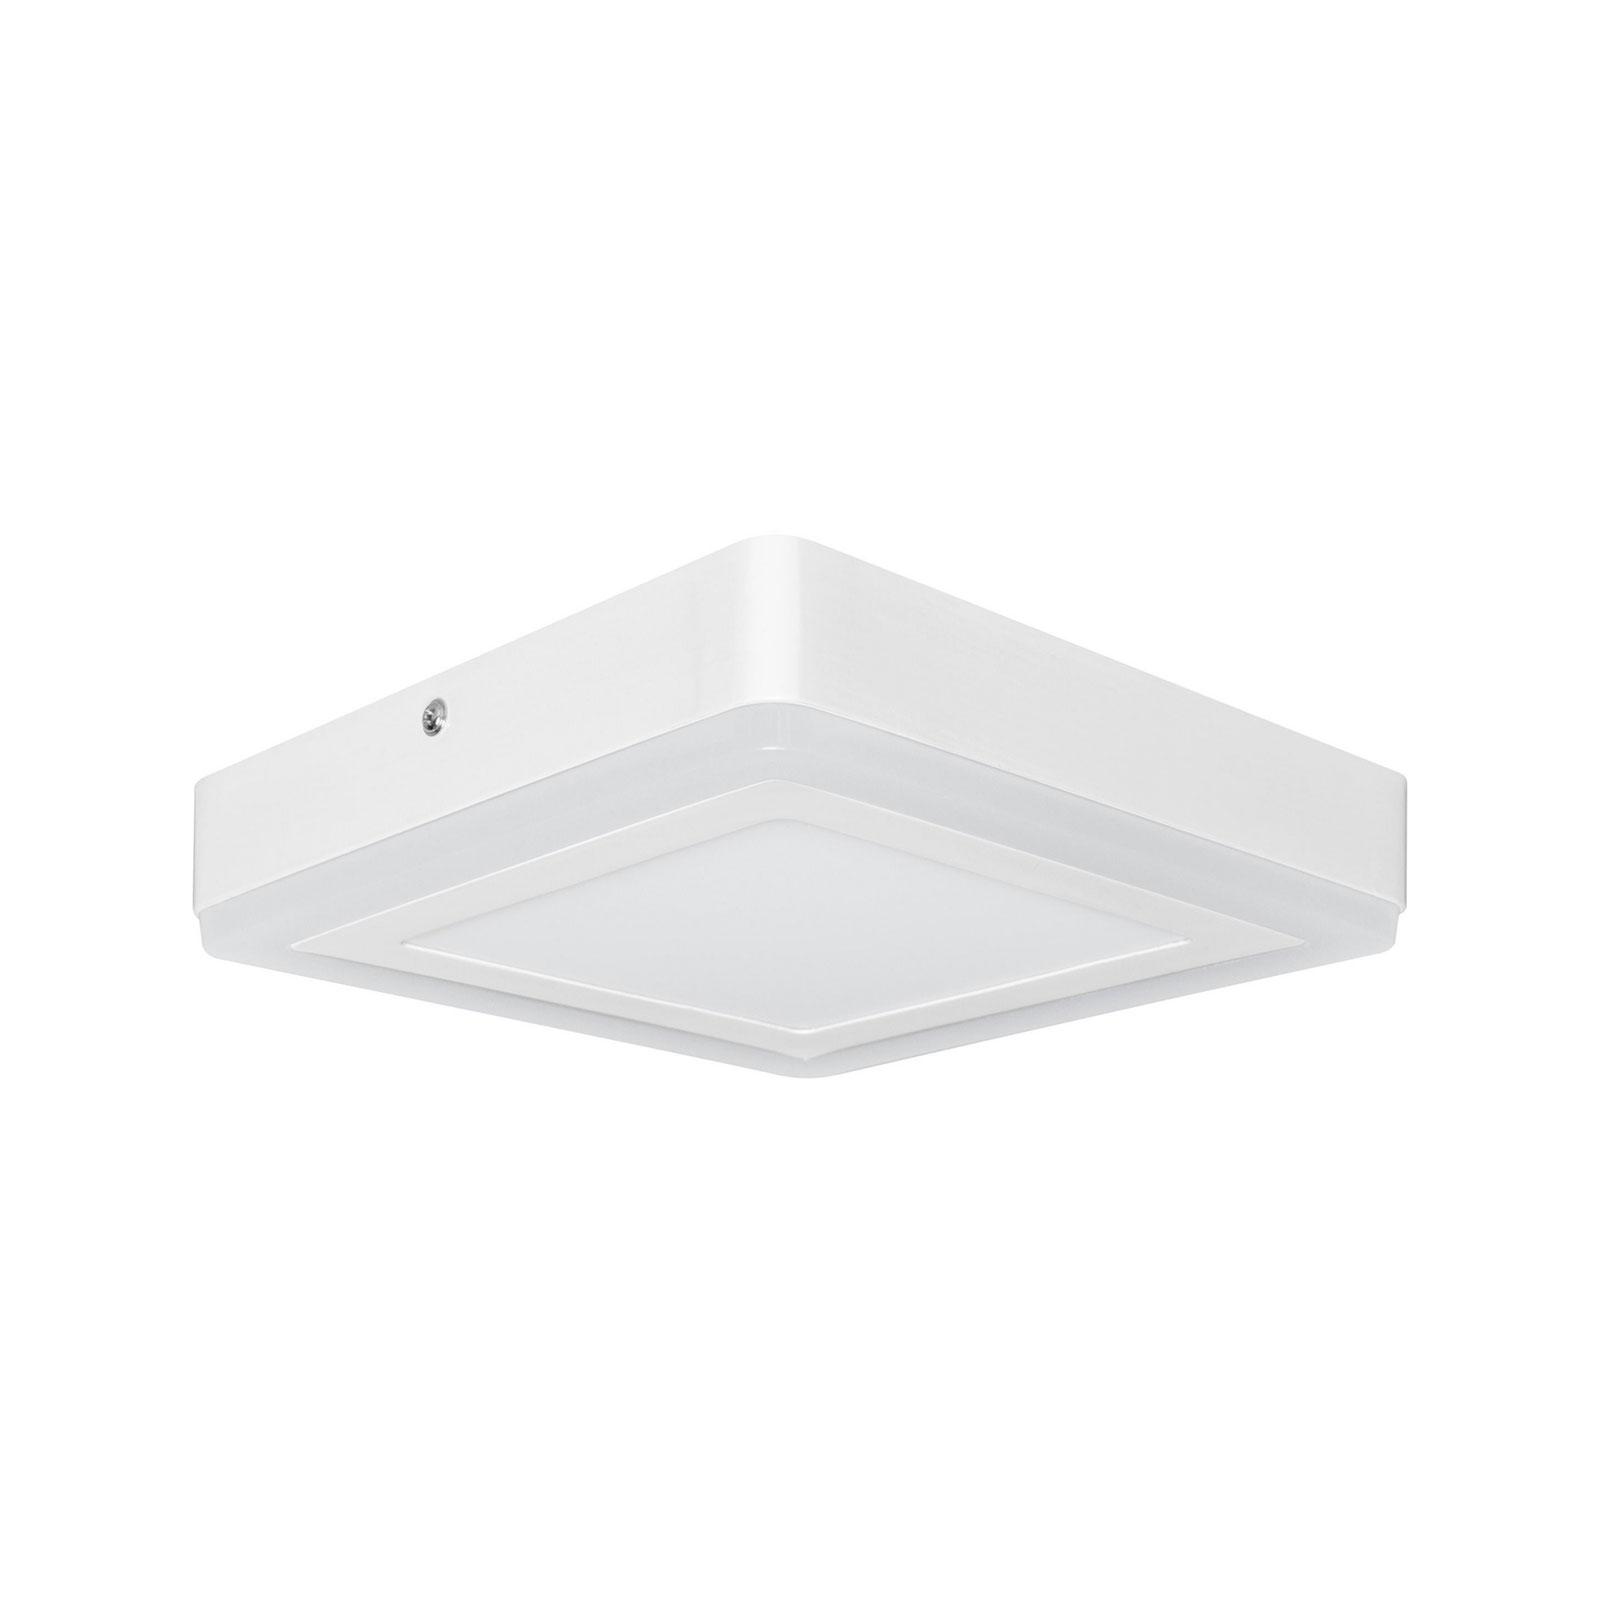 LEDVANCE LED Click White Square Deckenlampe 20cm